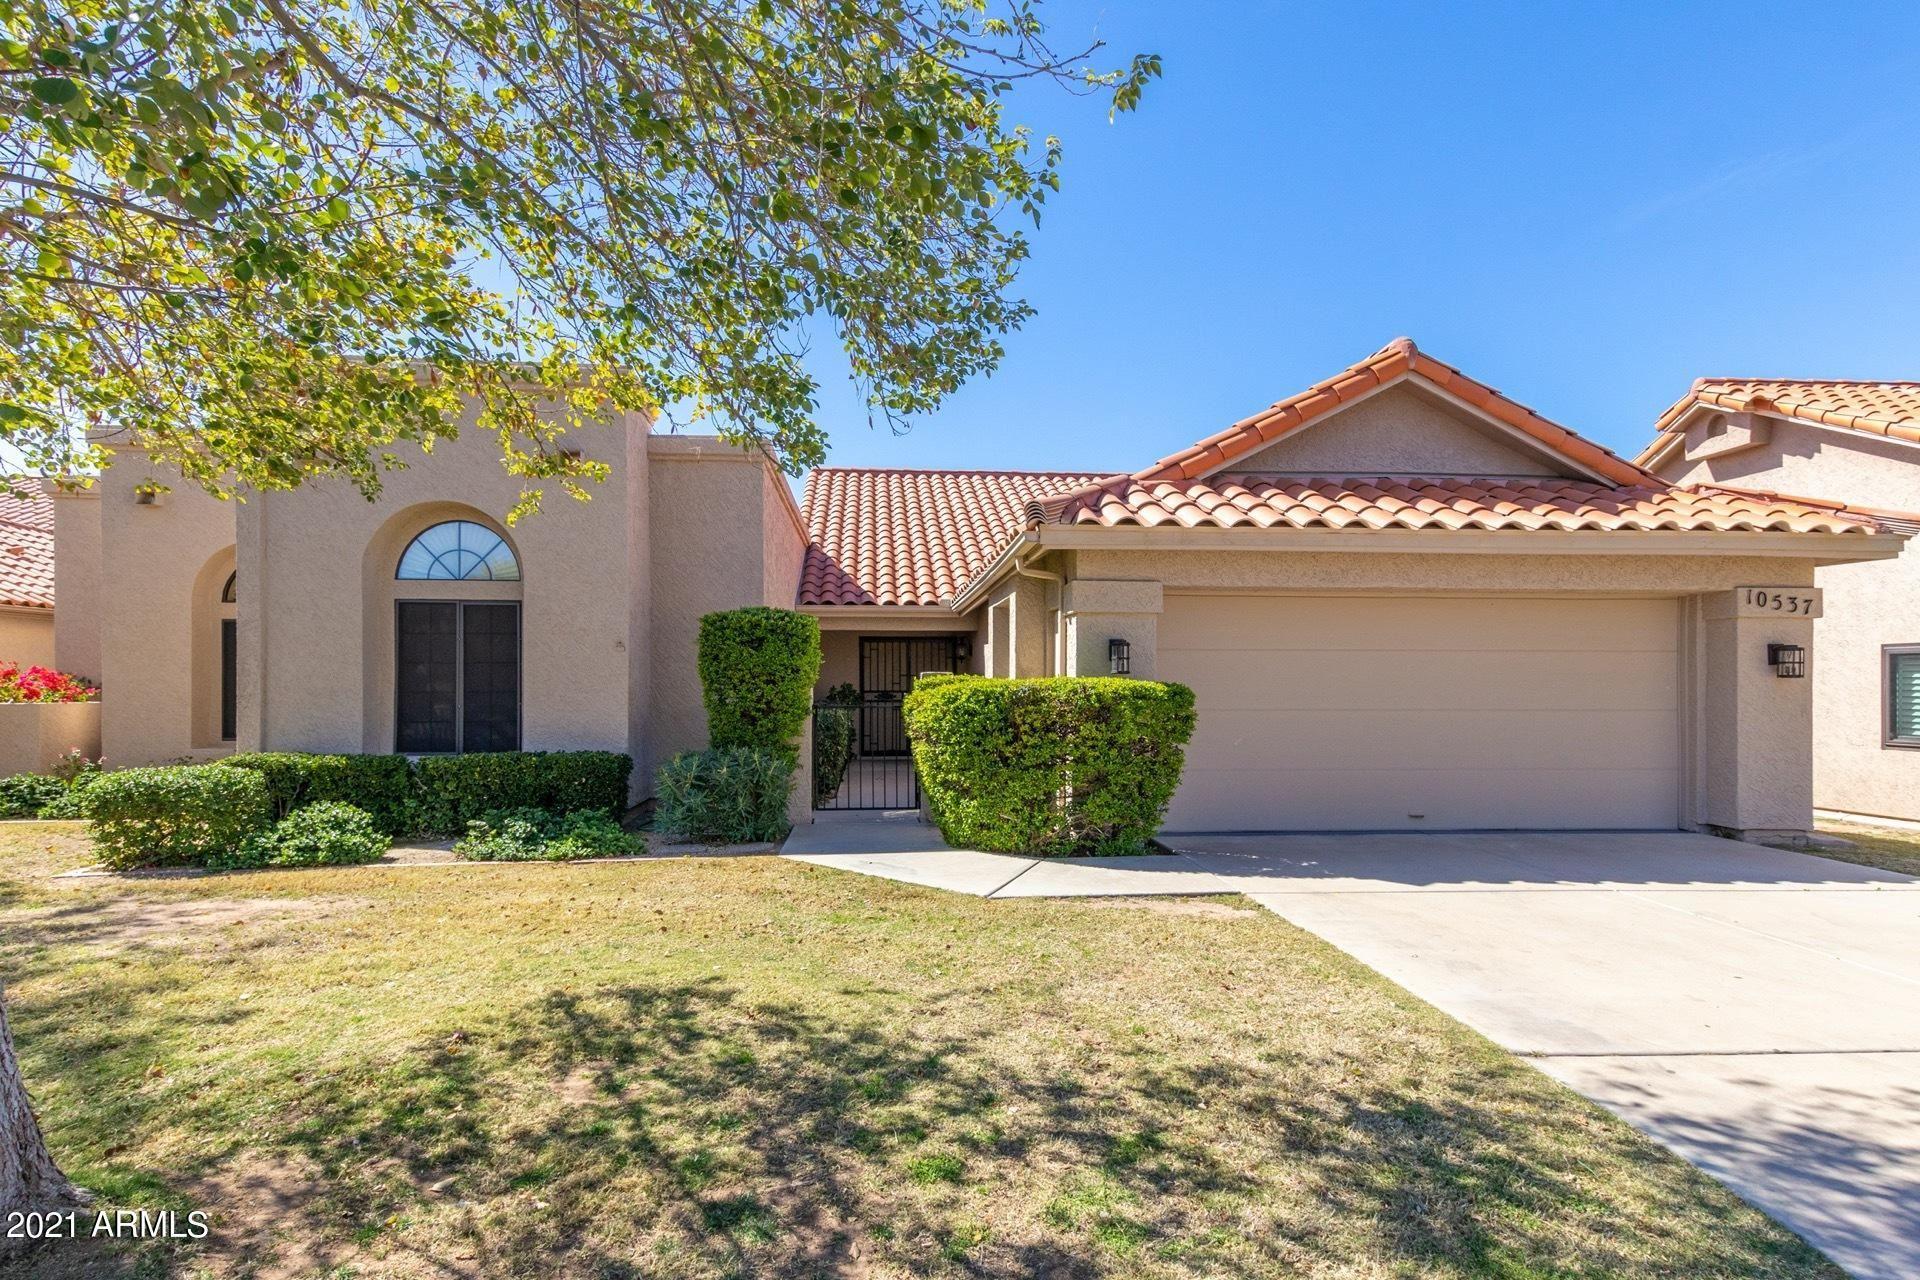 Photo of 10537 E CINNABAR Avenue, Scottsdale, AZ 85258 (MLS # 6201707)